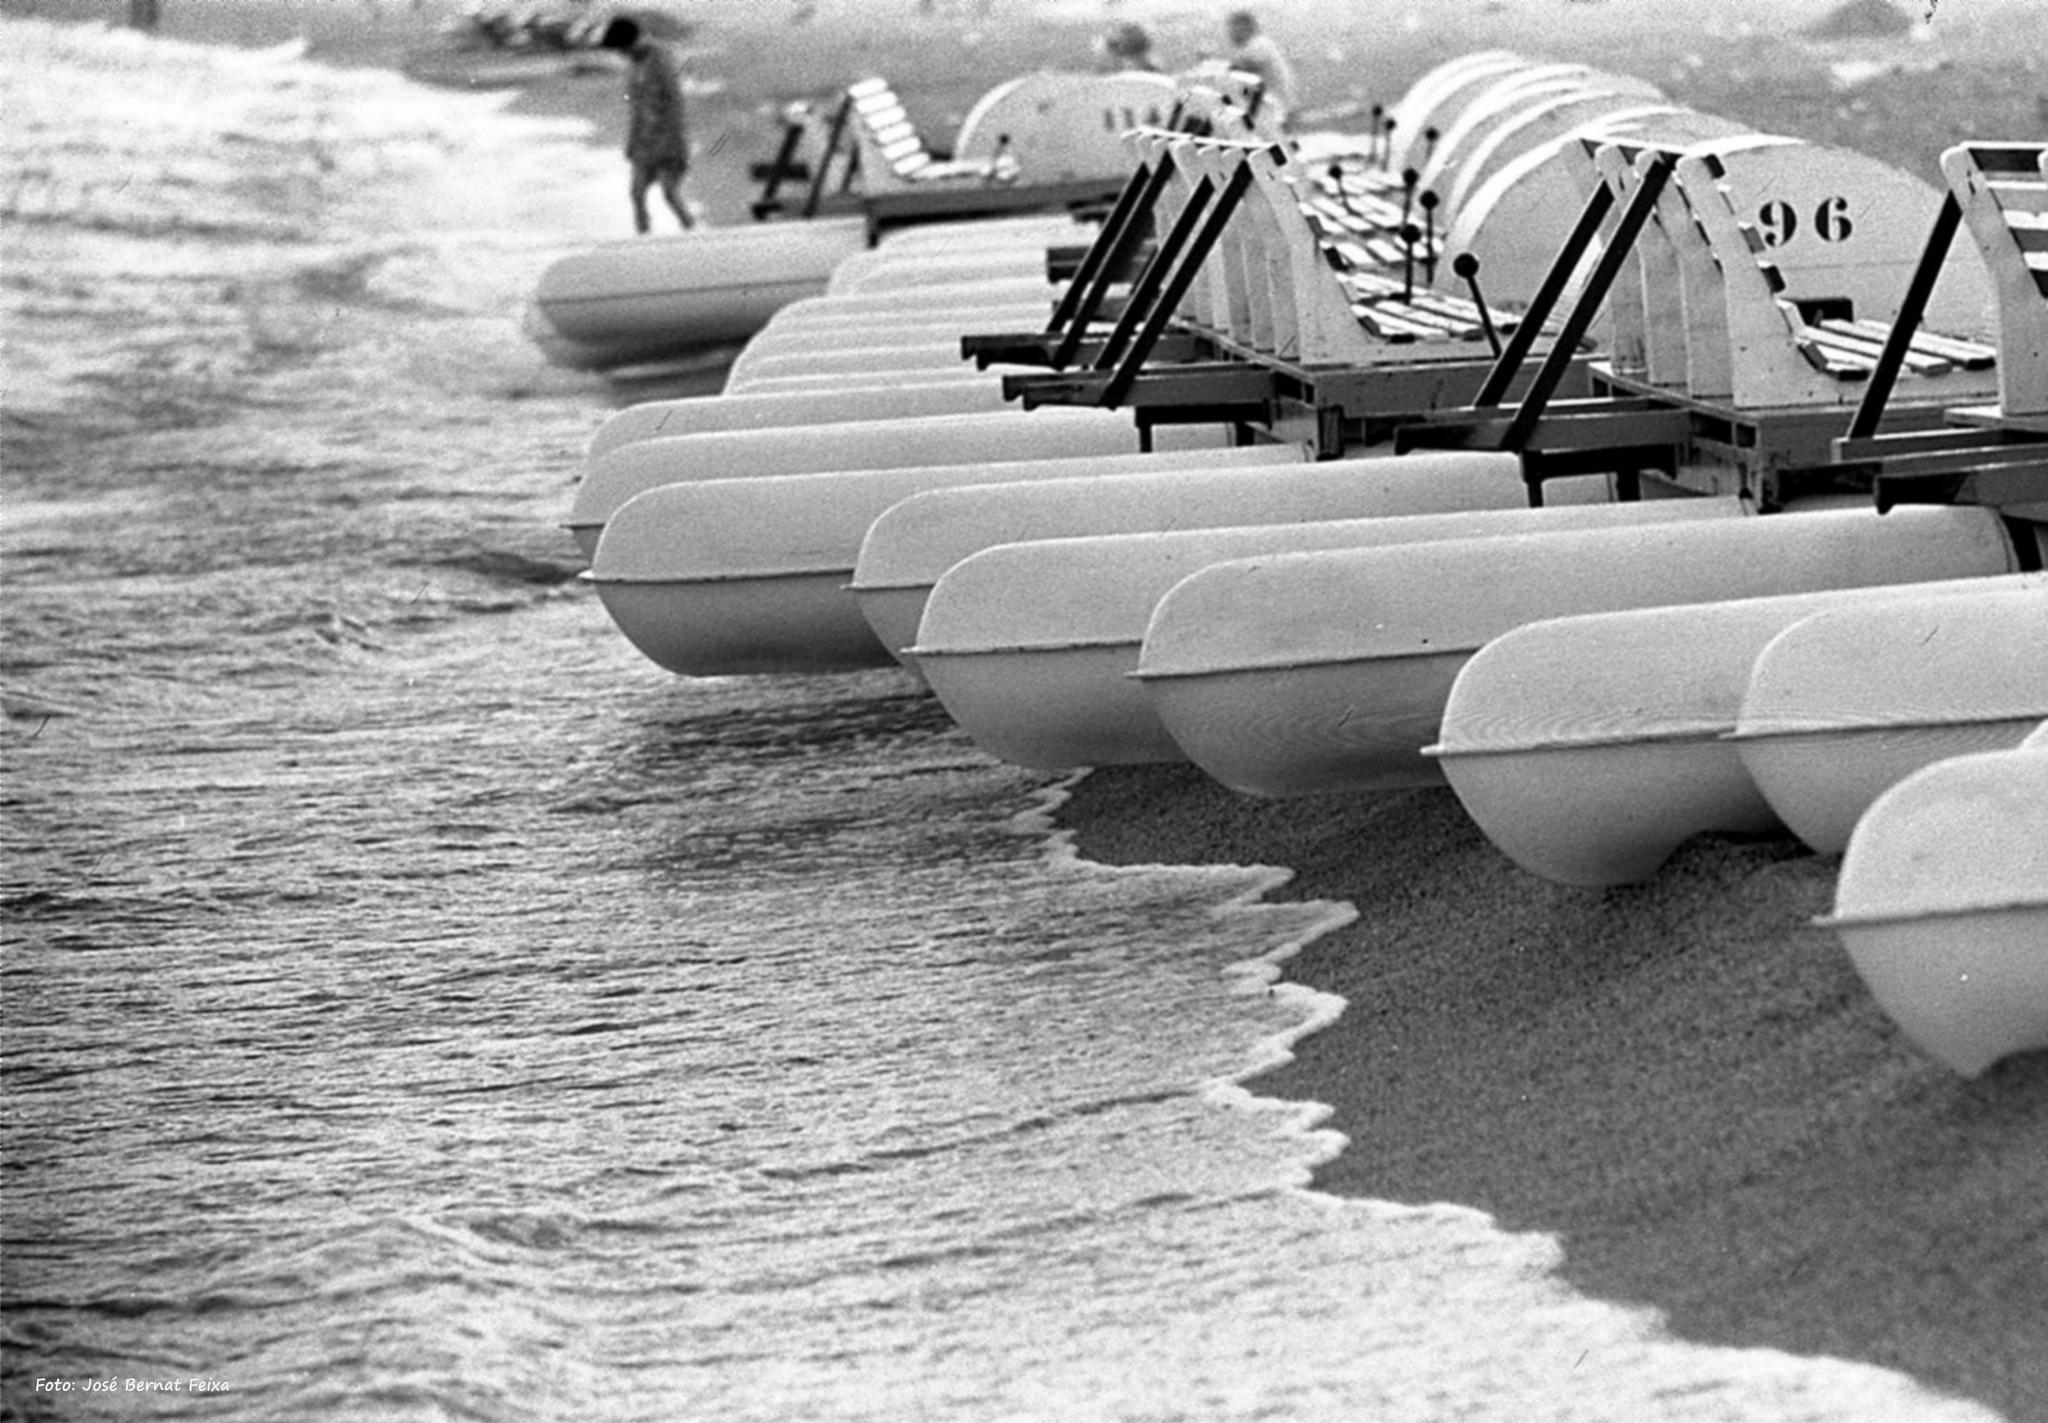 PATINES DE AGUA, WATERFIETSEN, WATER BICYCLES (60's) by José Bernat Feixa